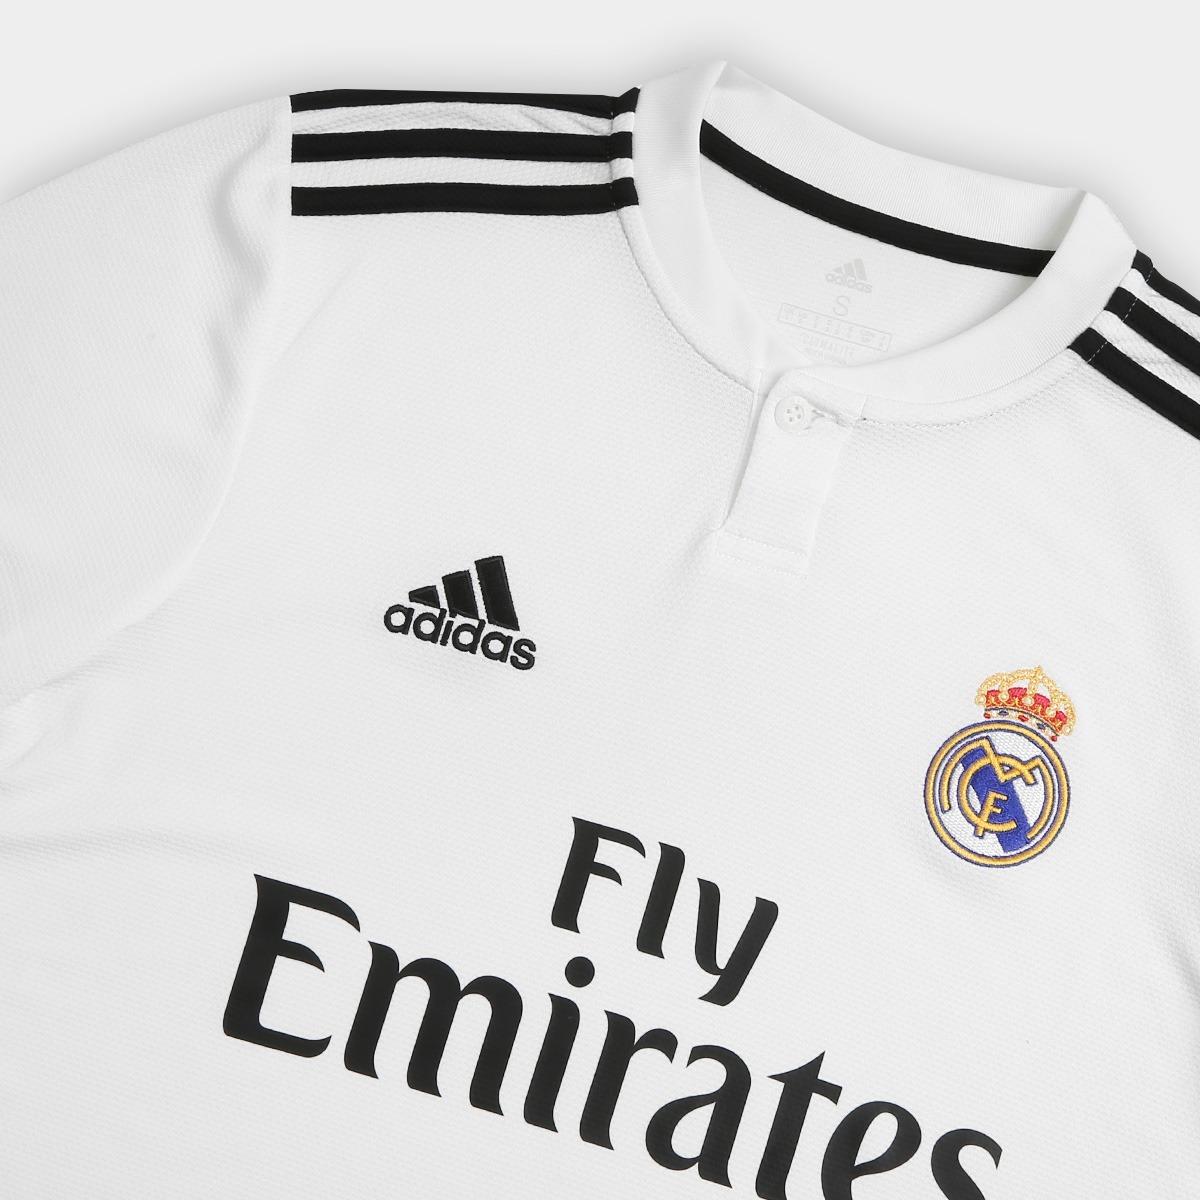 39bb5ec107593 nova camisa real de madrid fifa oficial 2019 oferta envio já. Carregando  zoom.